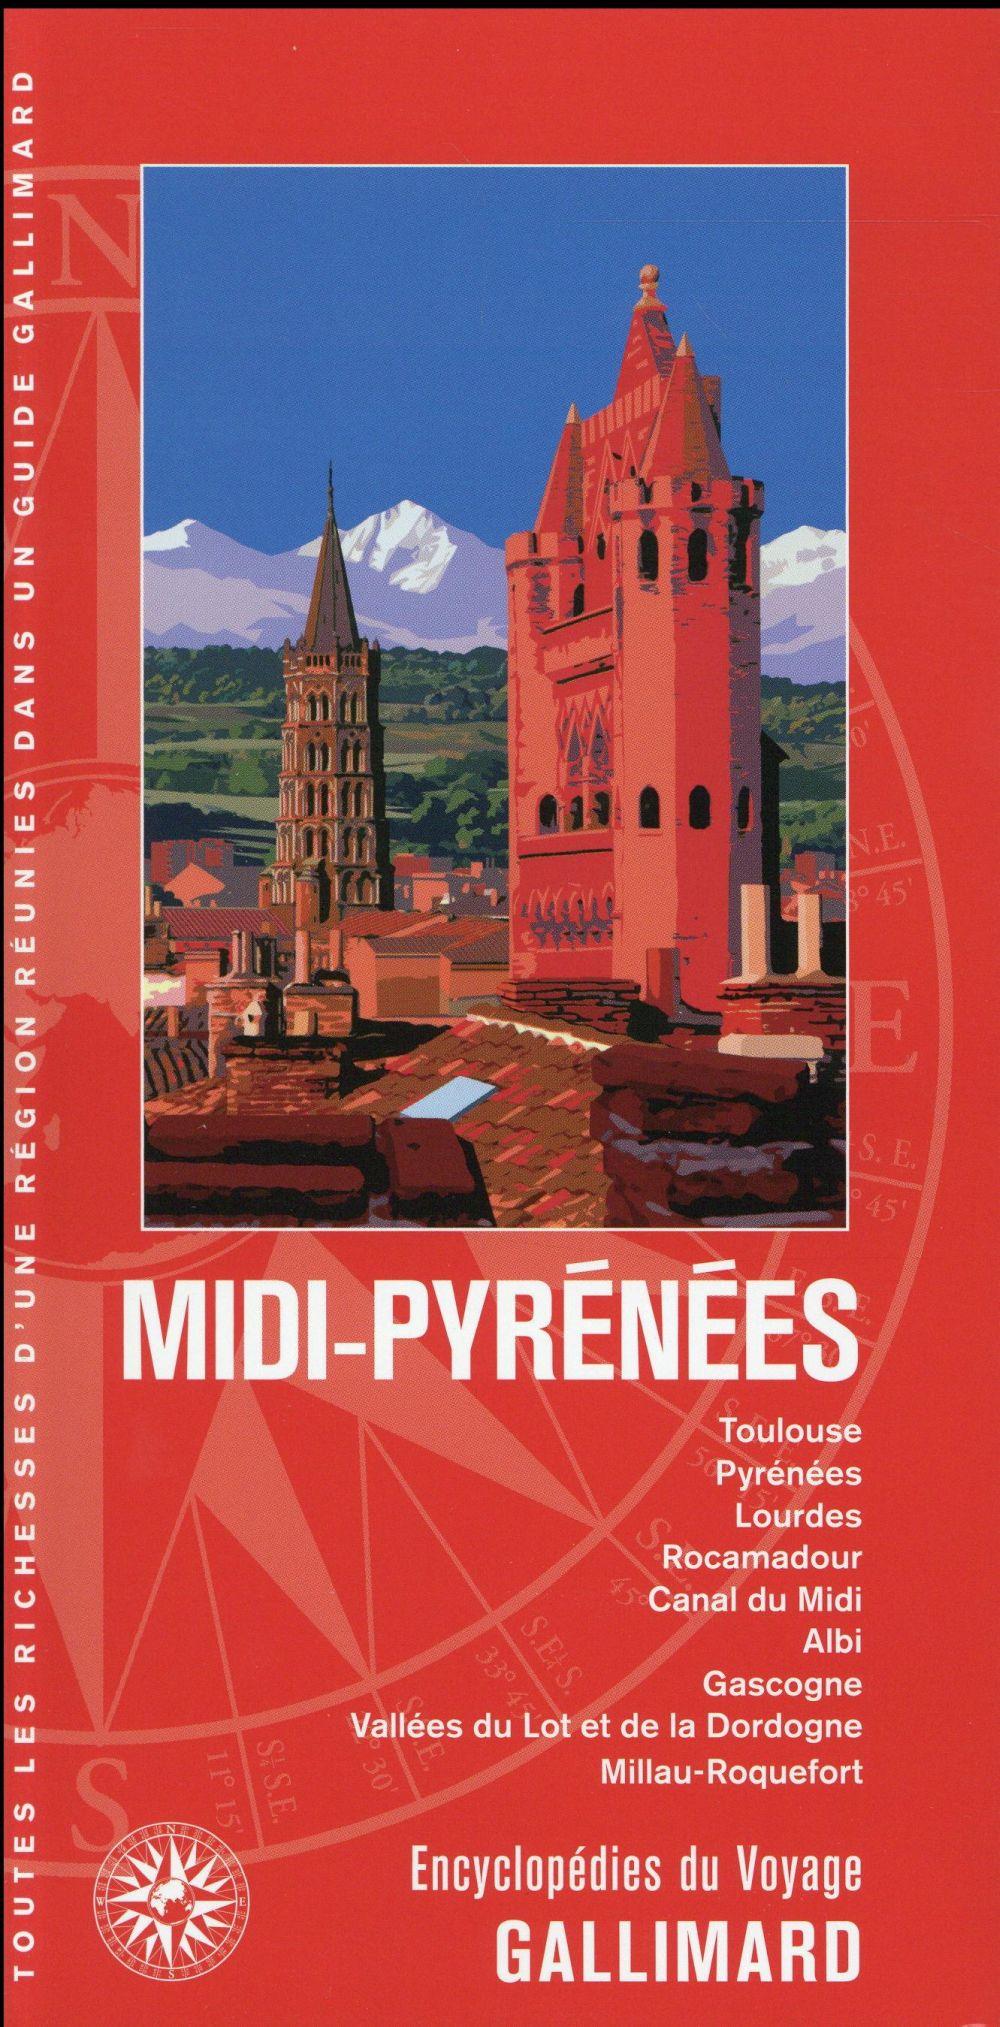 MIDI-PYRENEES - TOULOUSE, PYRENEES, LOURDES, ROCAMADOUR, CANAL DU MIDI, ALBI, GASCOGNE, VALLEES DU L